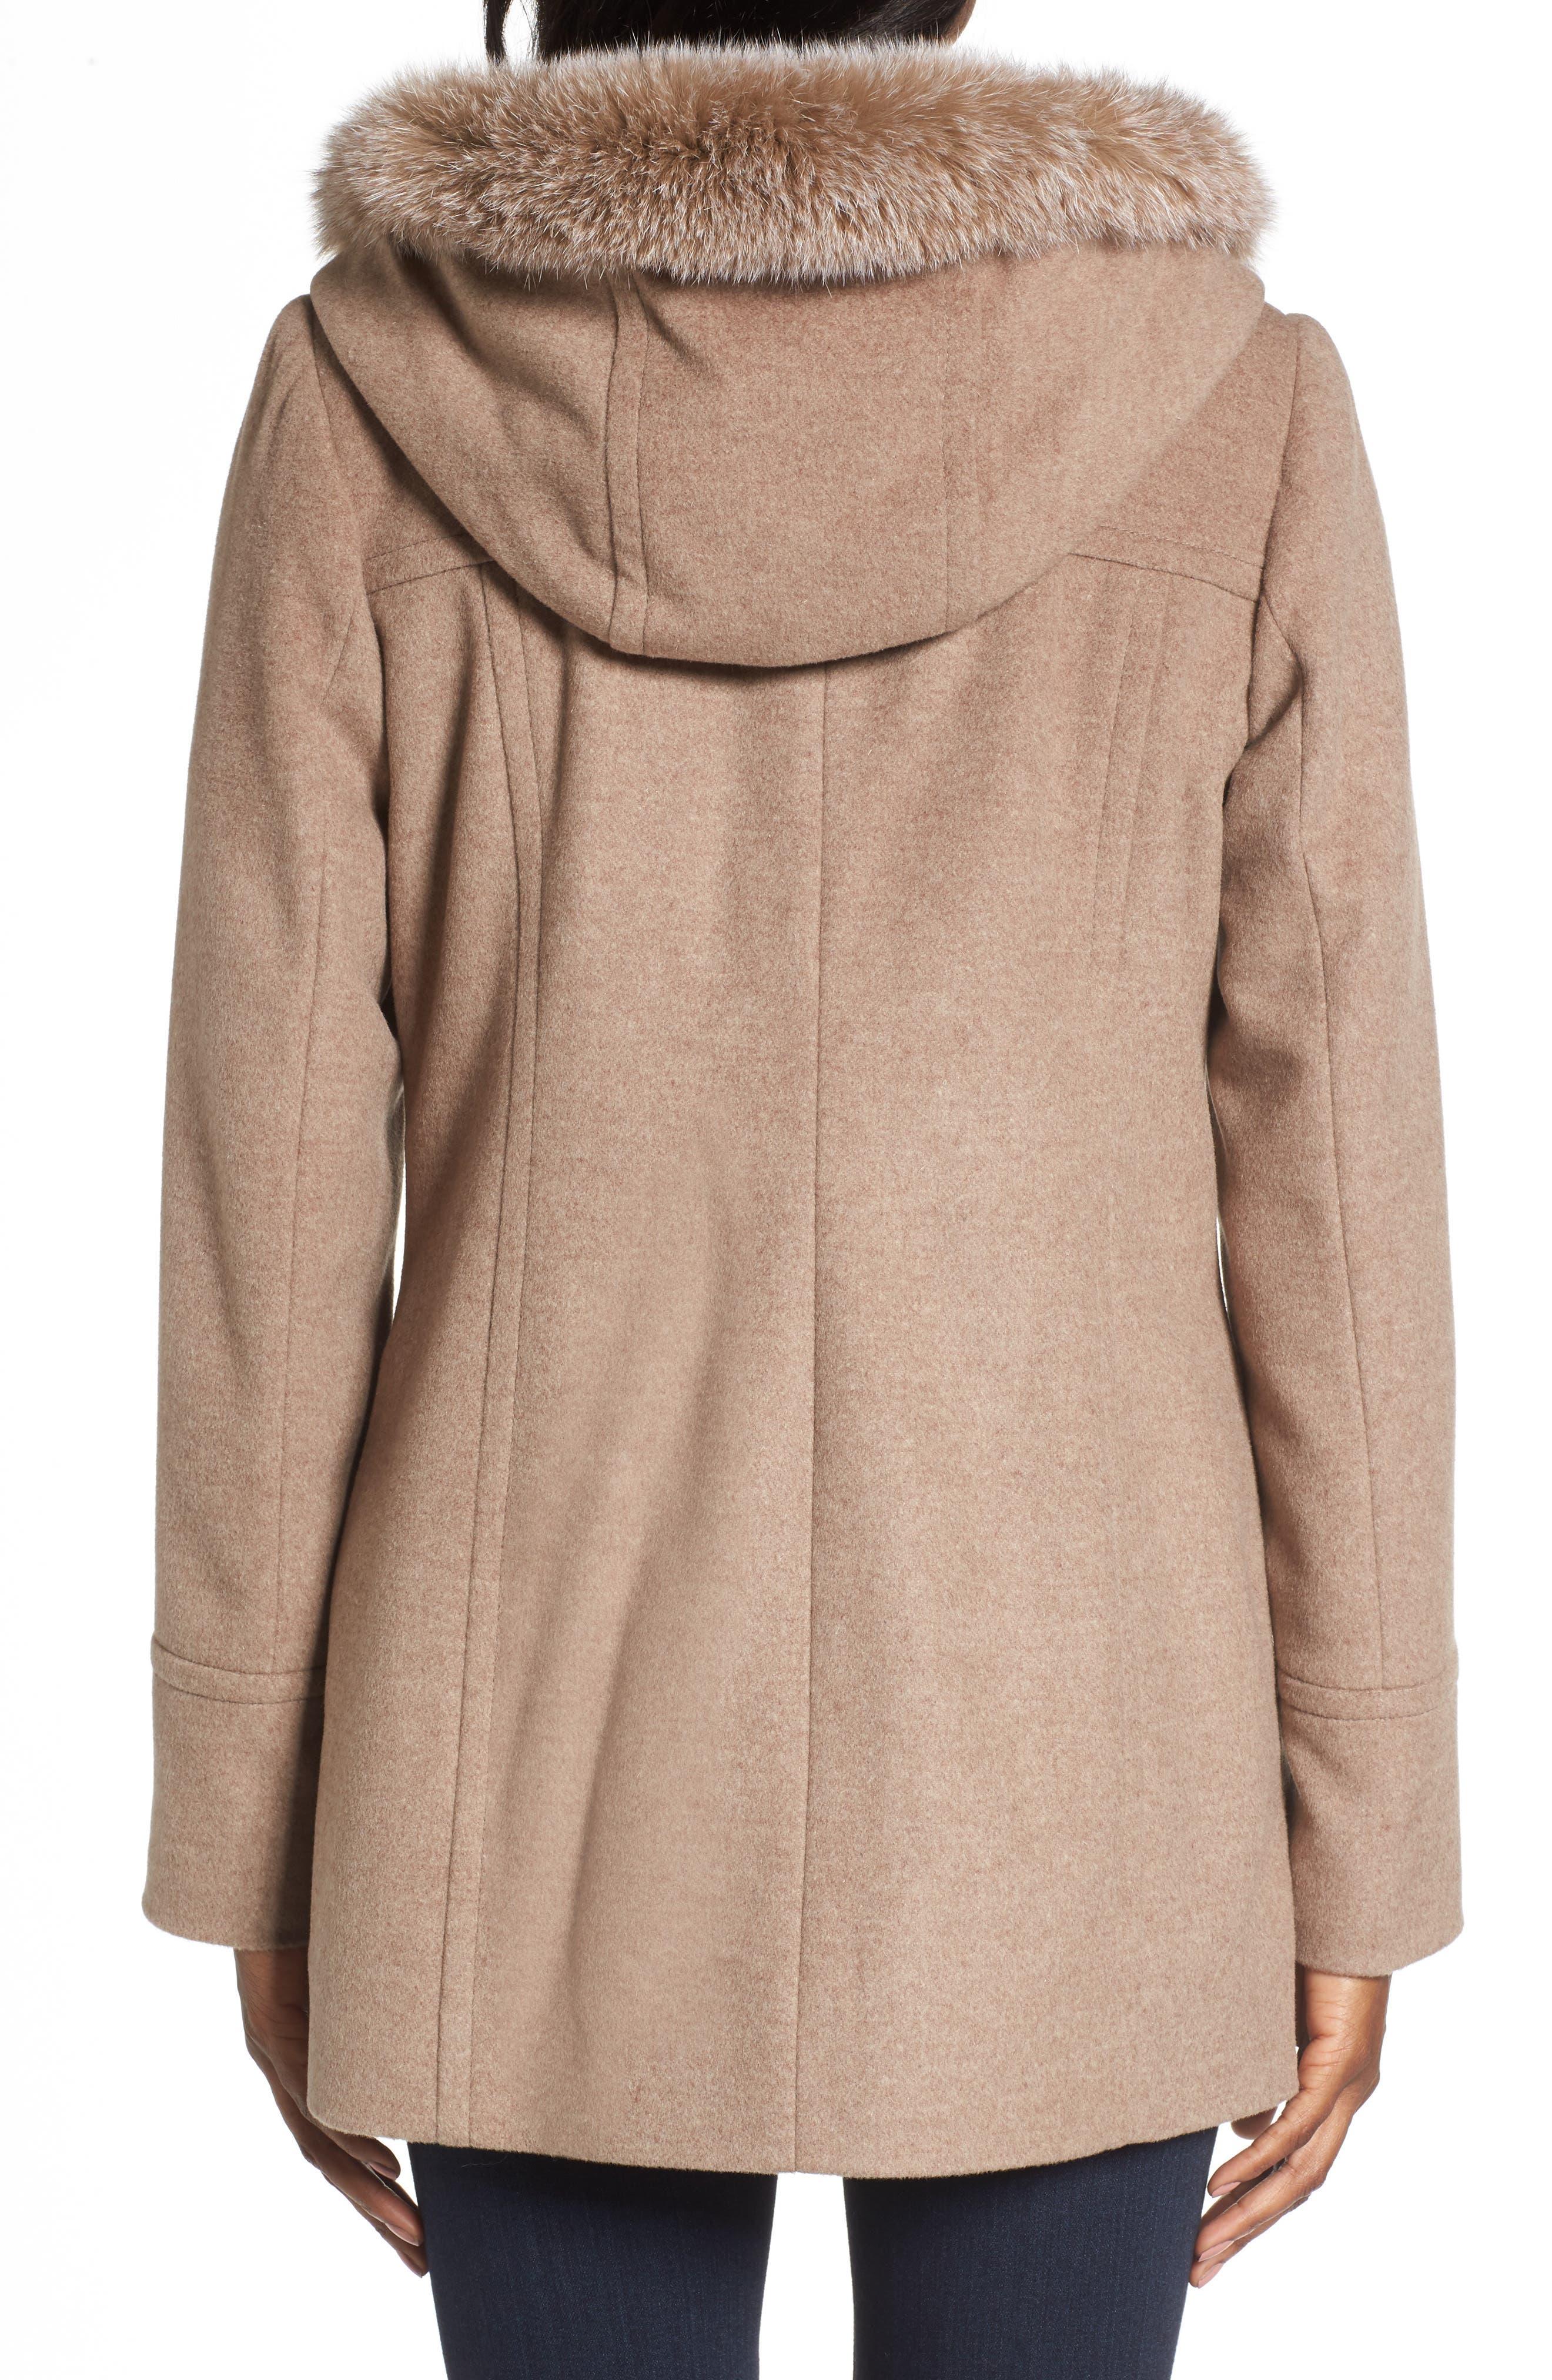 Hooded Wool Blend Coat with Genuine Fox Fur Trim,                             Alternate thumbnail 5, color,